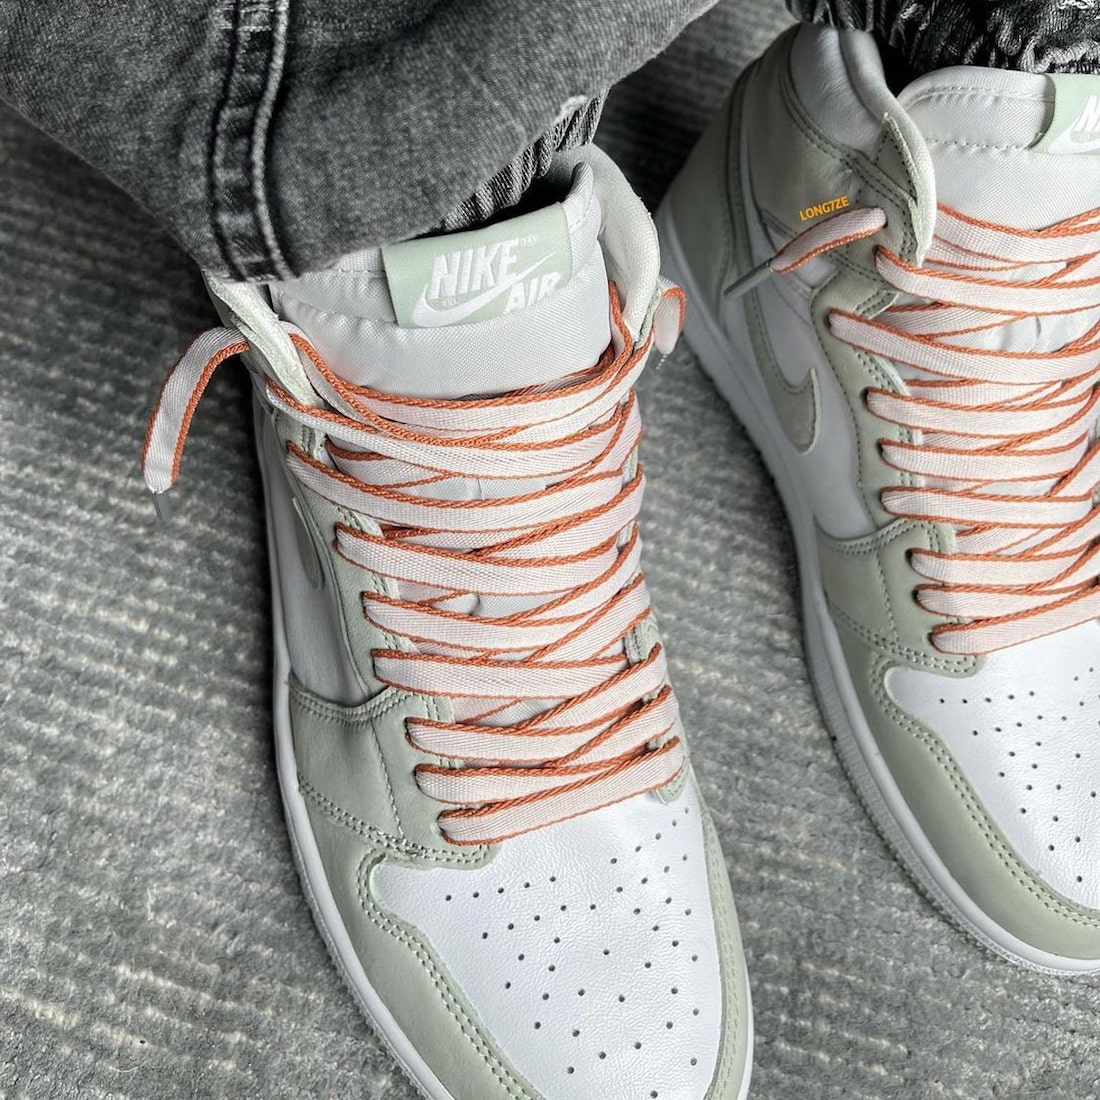 Air Jordan 1,Nike,发售  夏日小清新!高颜值 Air Jordan 1 今夏发售!